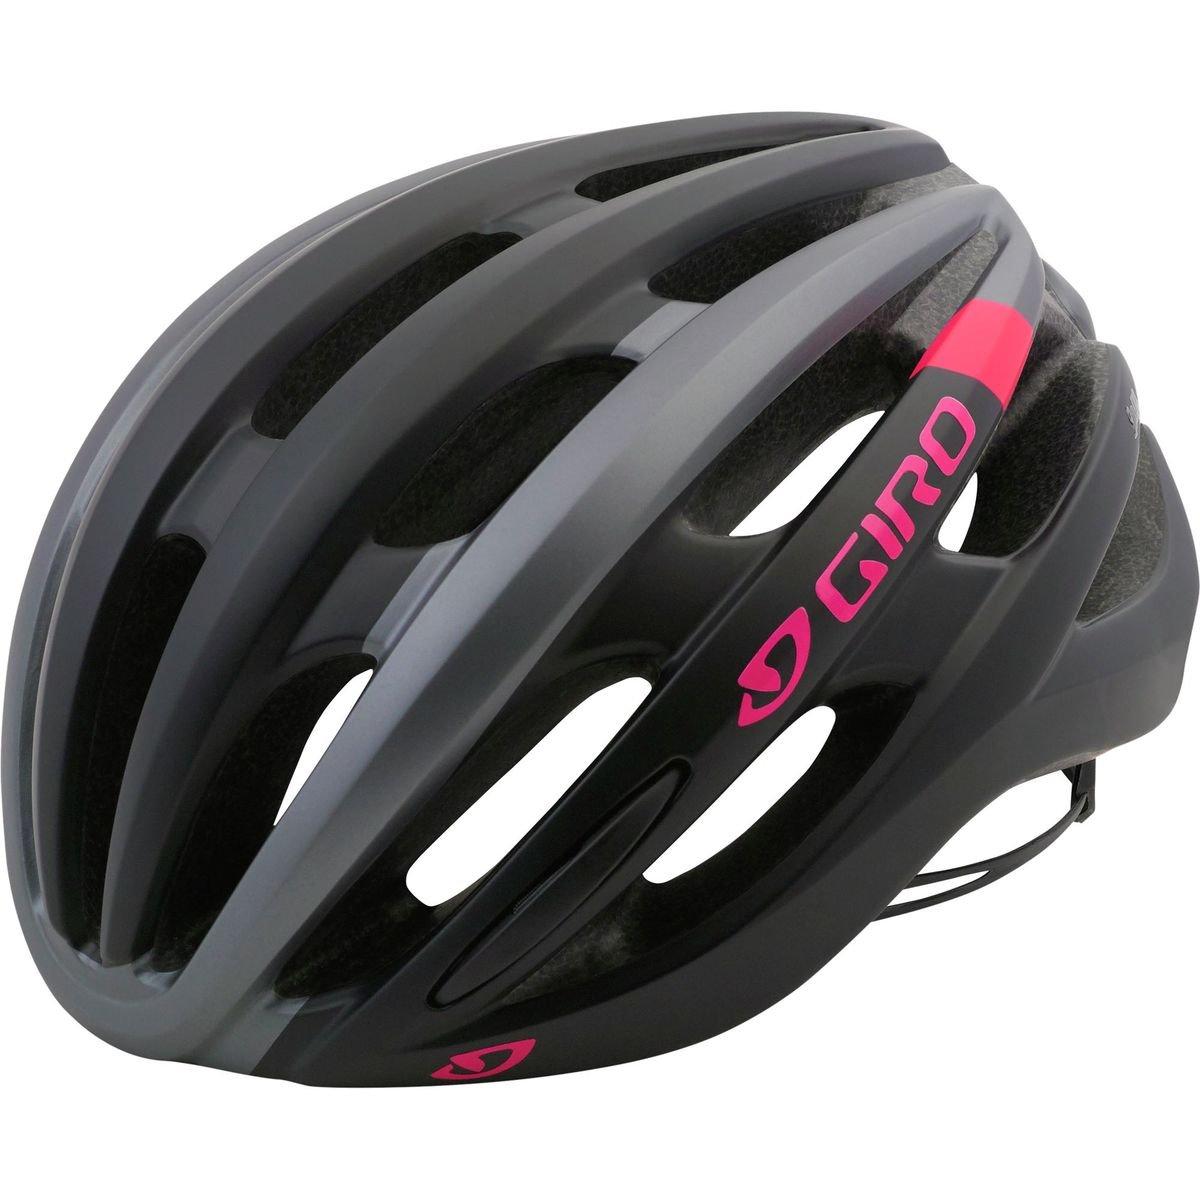 Giro Saga Cycling Helmet - Women's Matte Black/Pink Race Medium